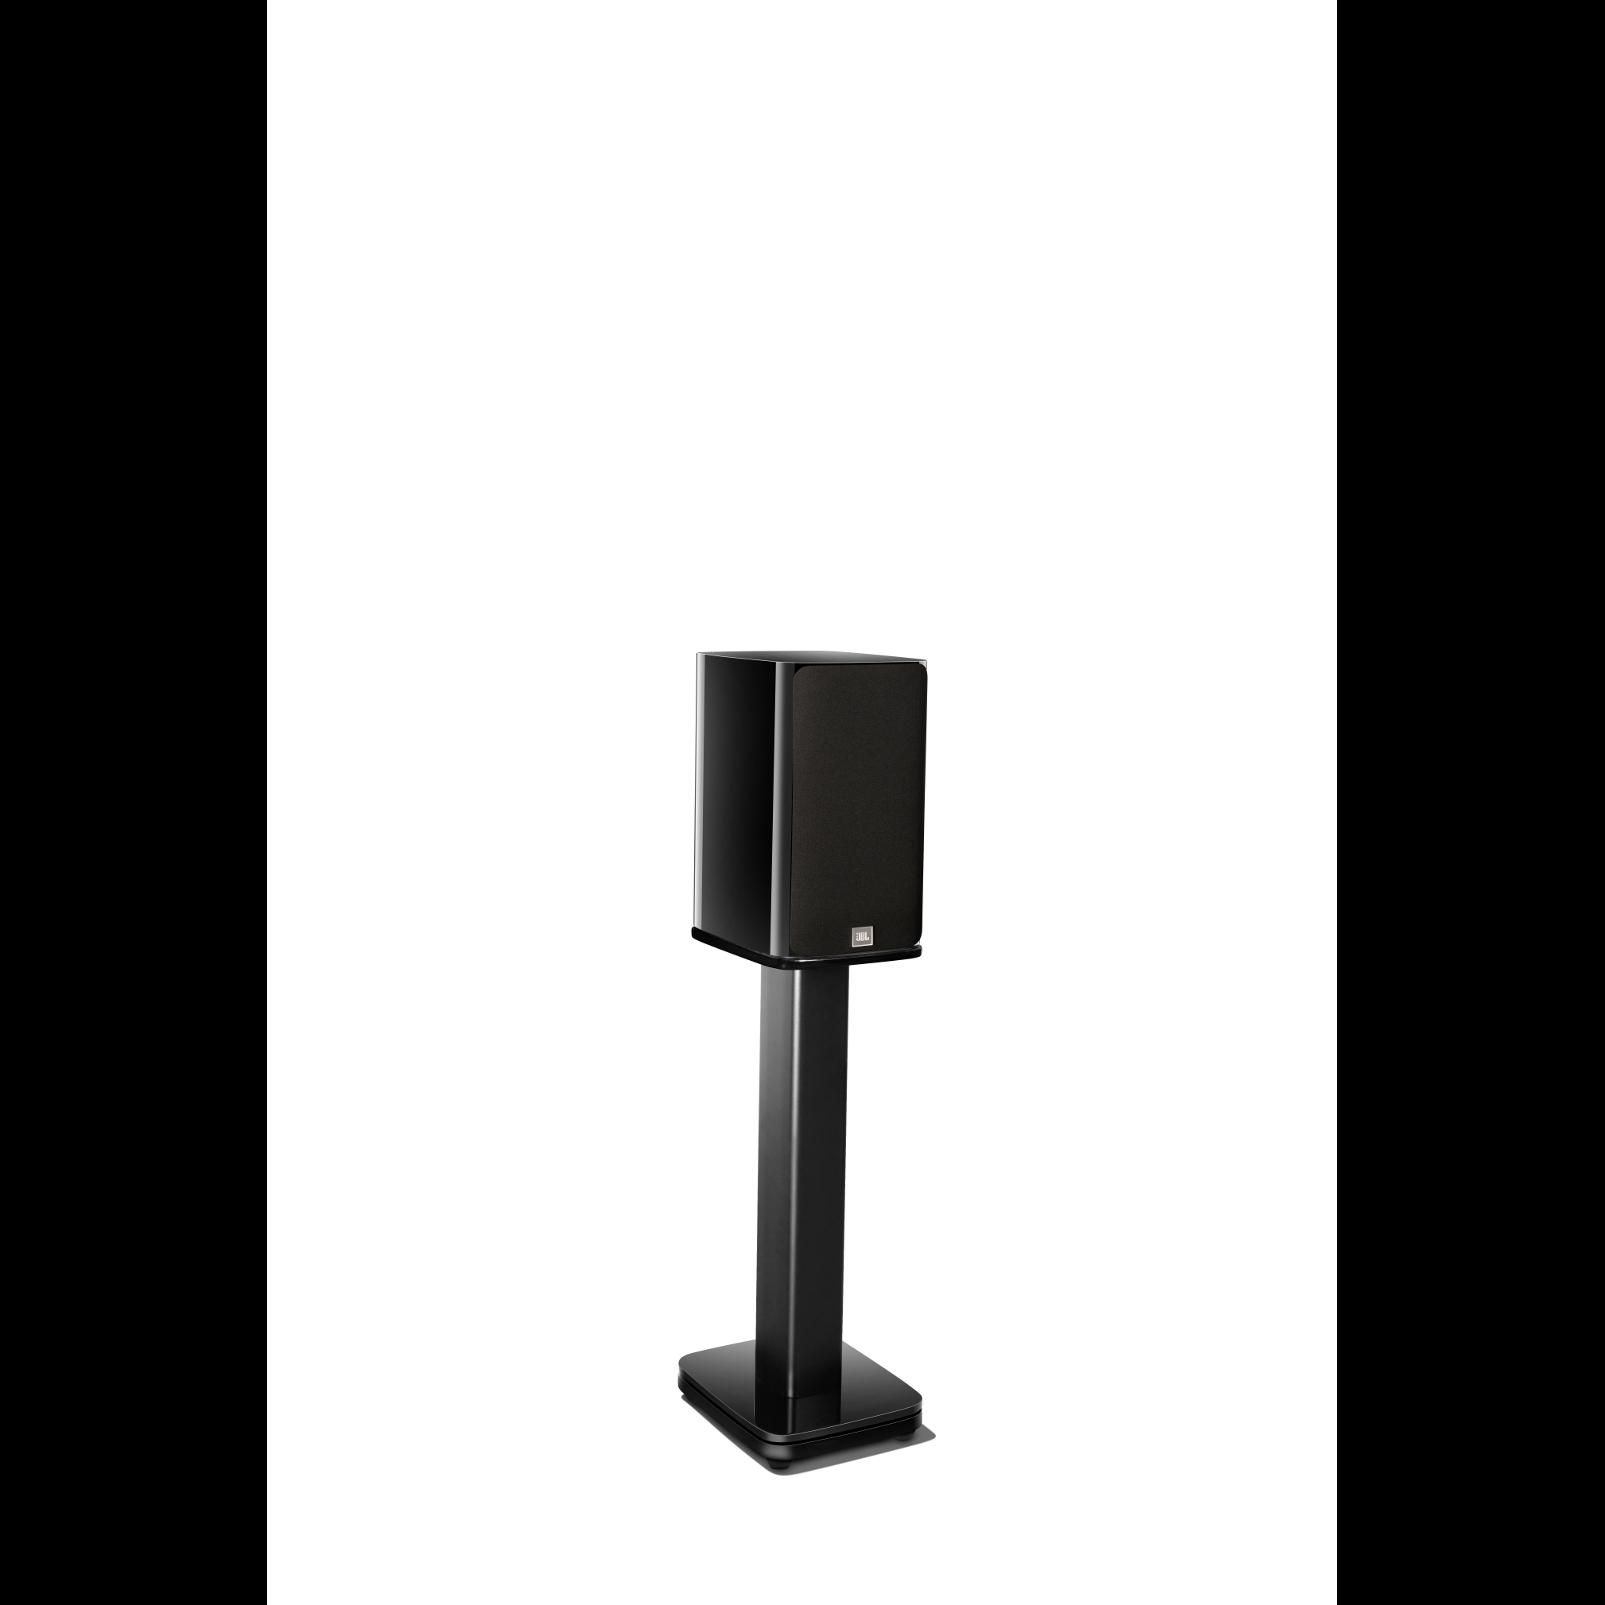 HDI-1600 - Black Gloss - 2-way 6.5-inch (165mm) Bookshelf Loudspeaker - Detailshot 2